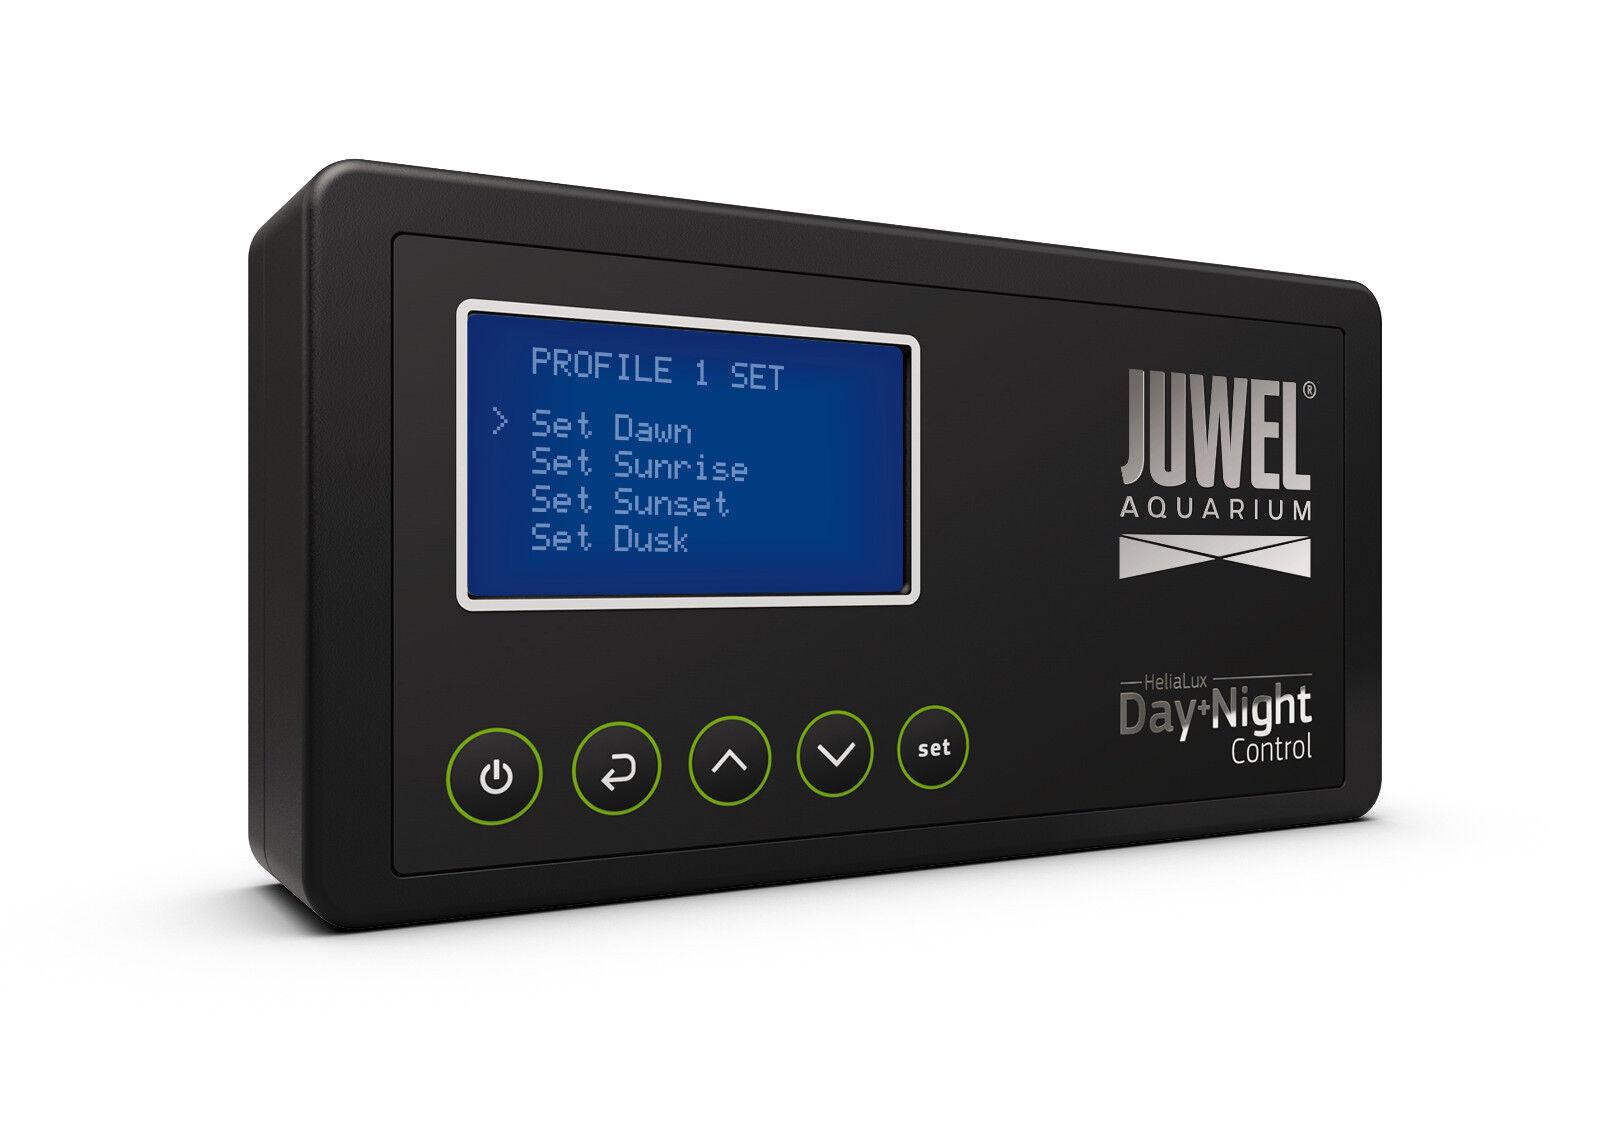 JUWEL HeliaLux Day + Night Control LED Steuerung der HeliaLux LED Leuchten